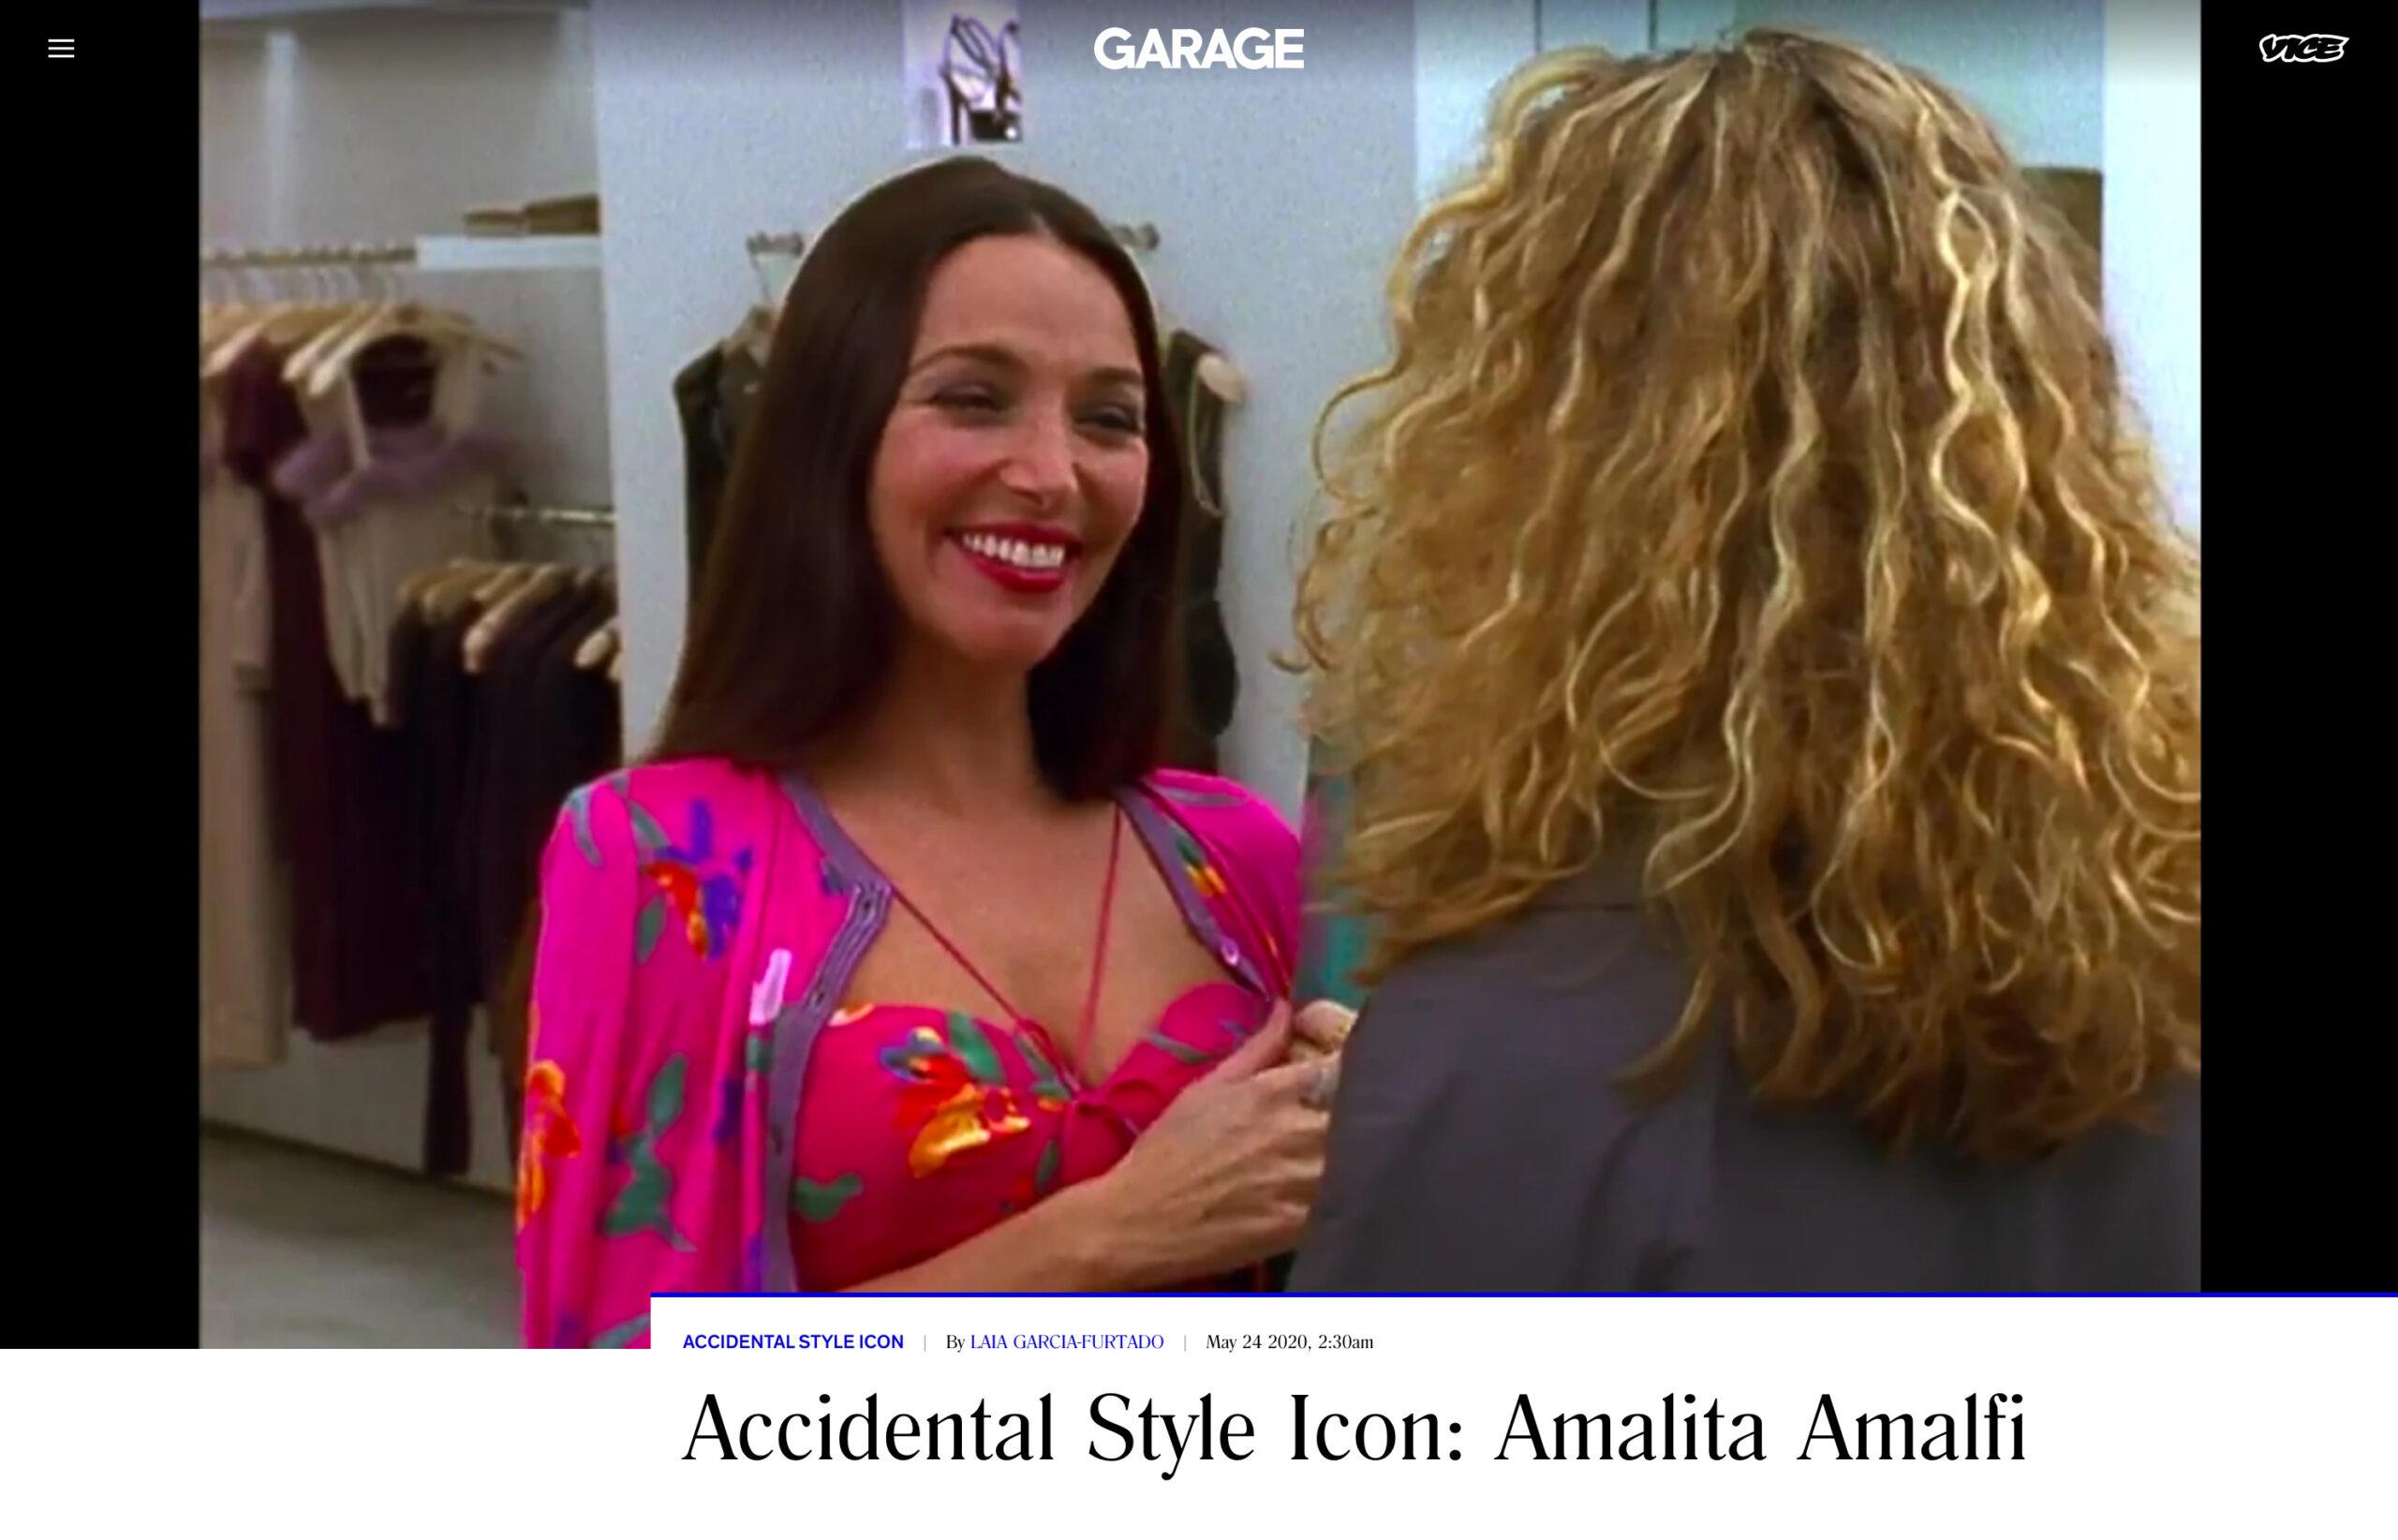 Carole Davis - Garage Magazine VICE Accidental Style Icon: Amalita Amalfi